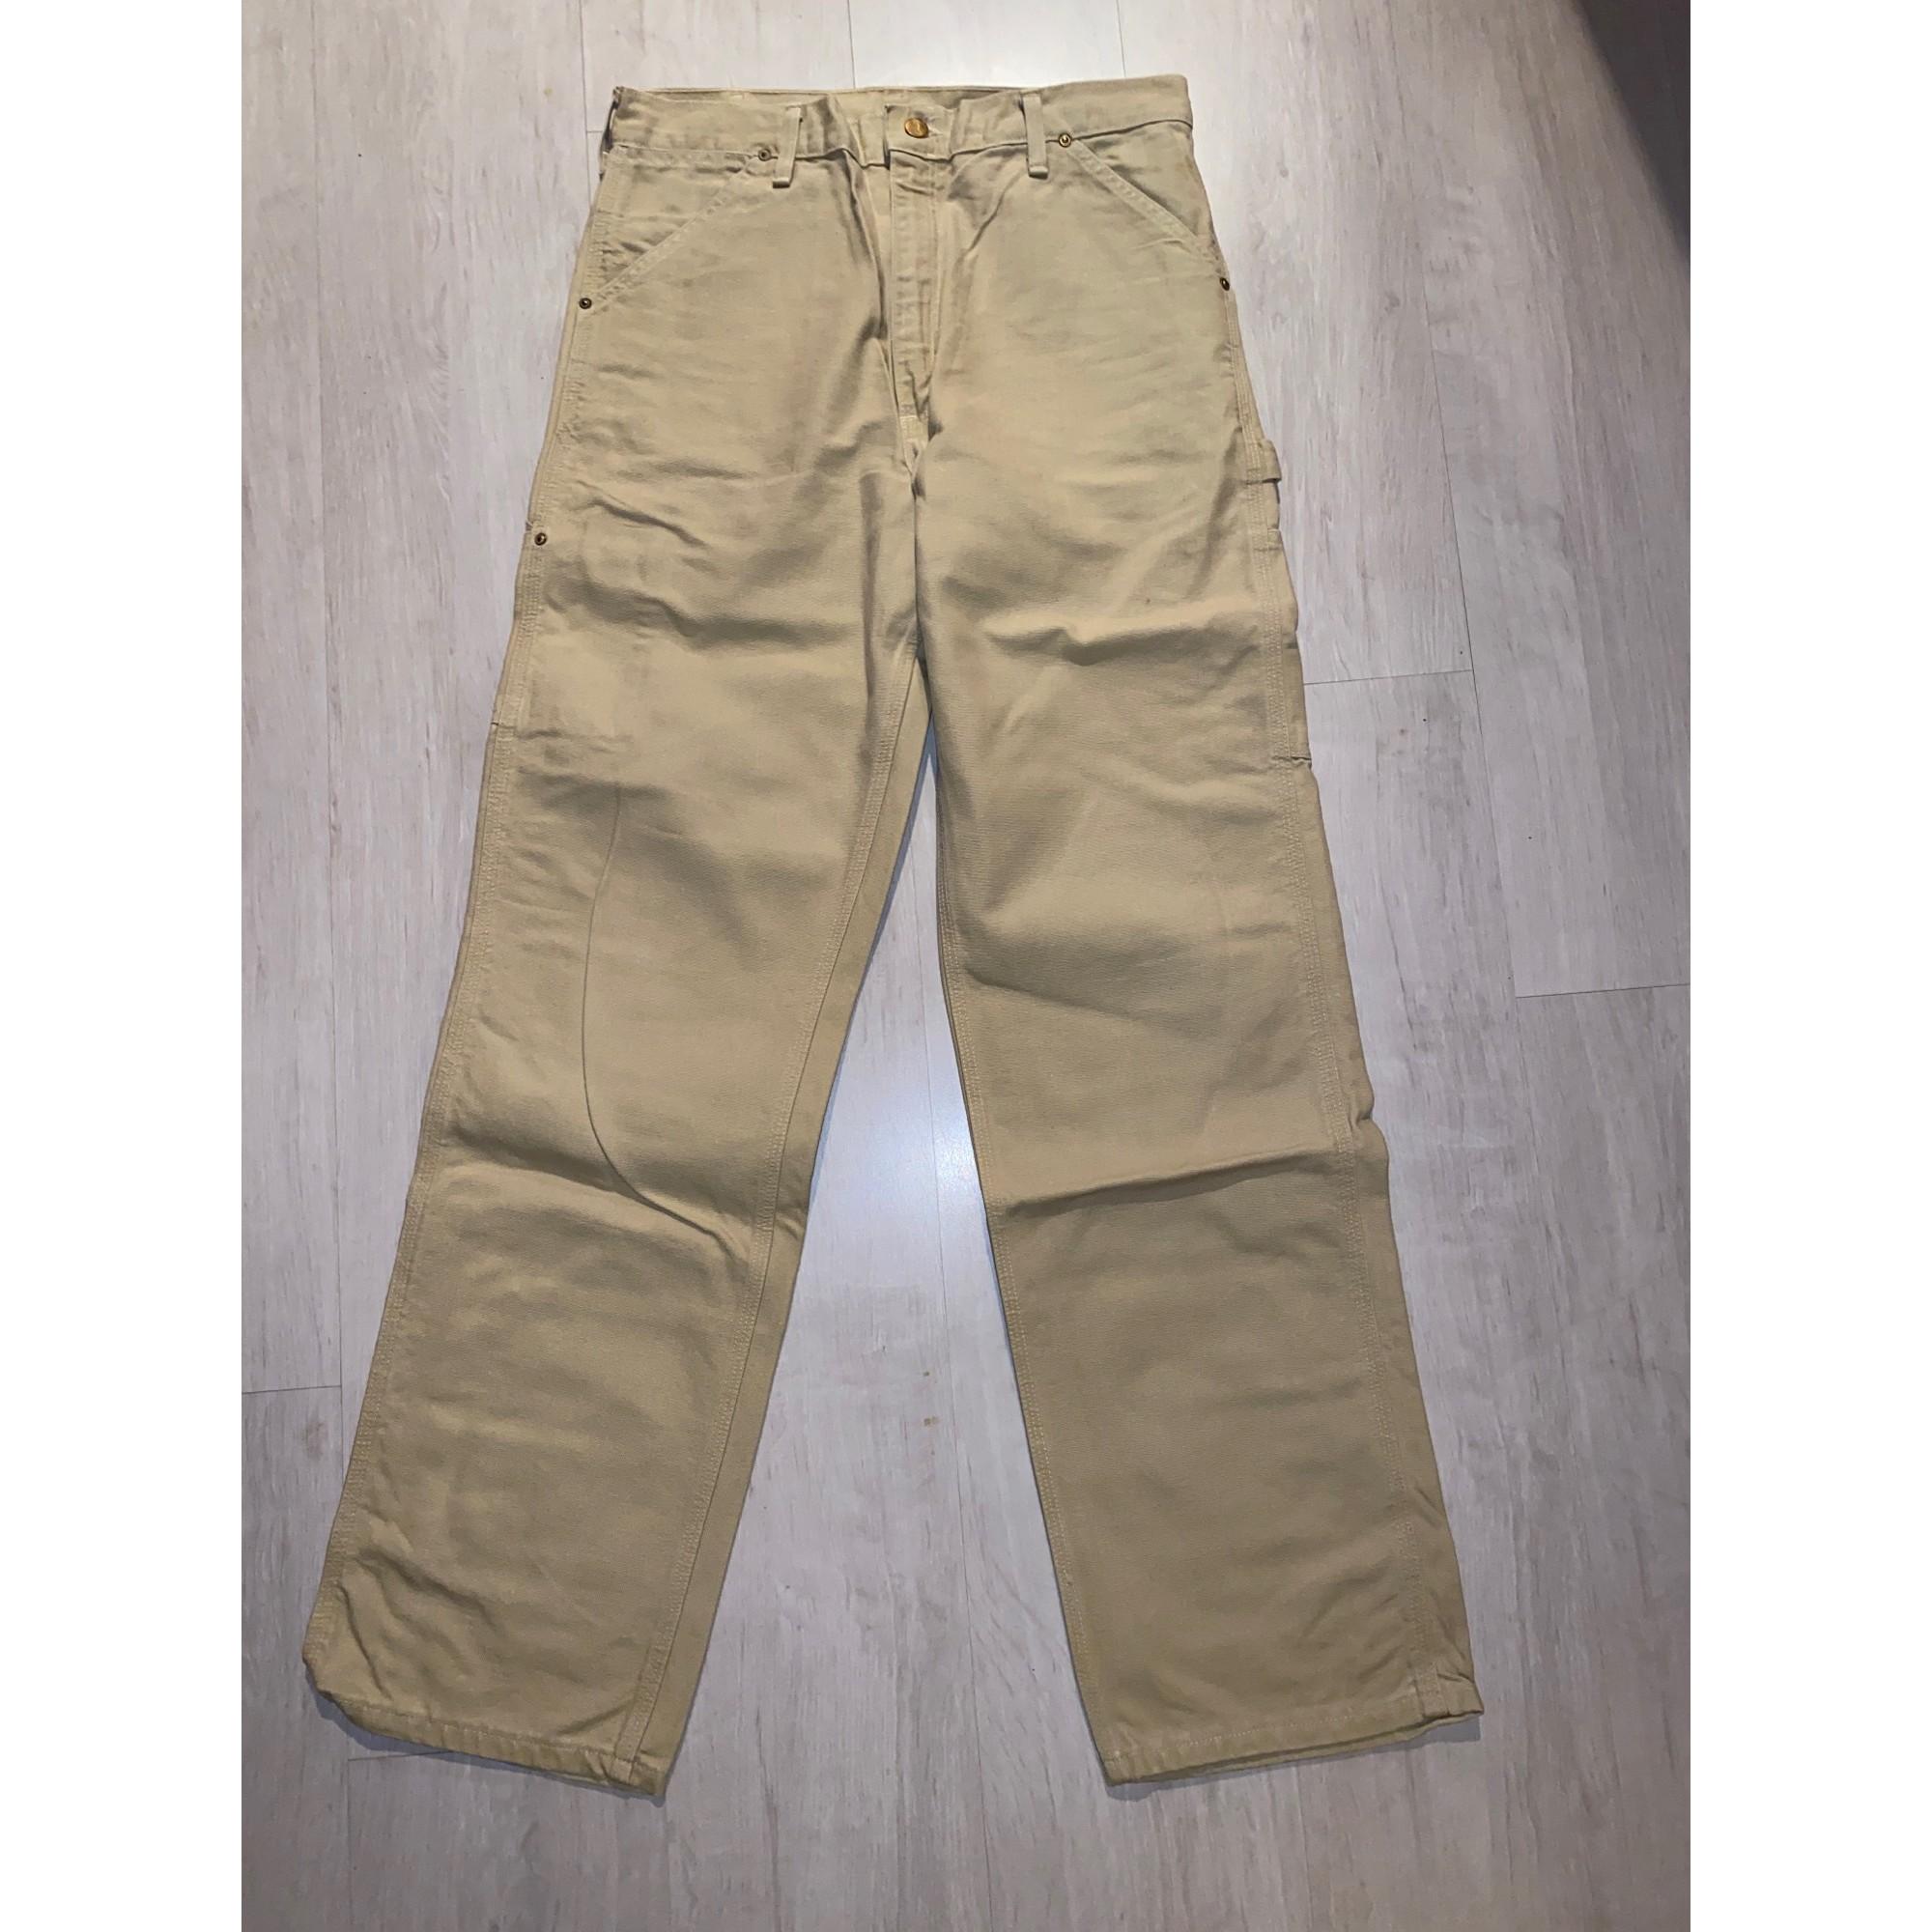 Jeans droit CARHARTT Beige, camel